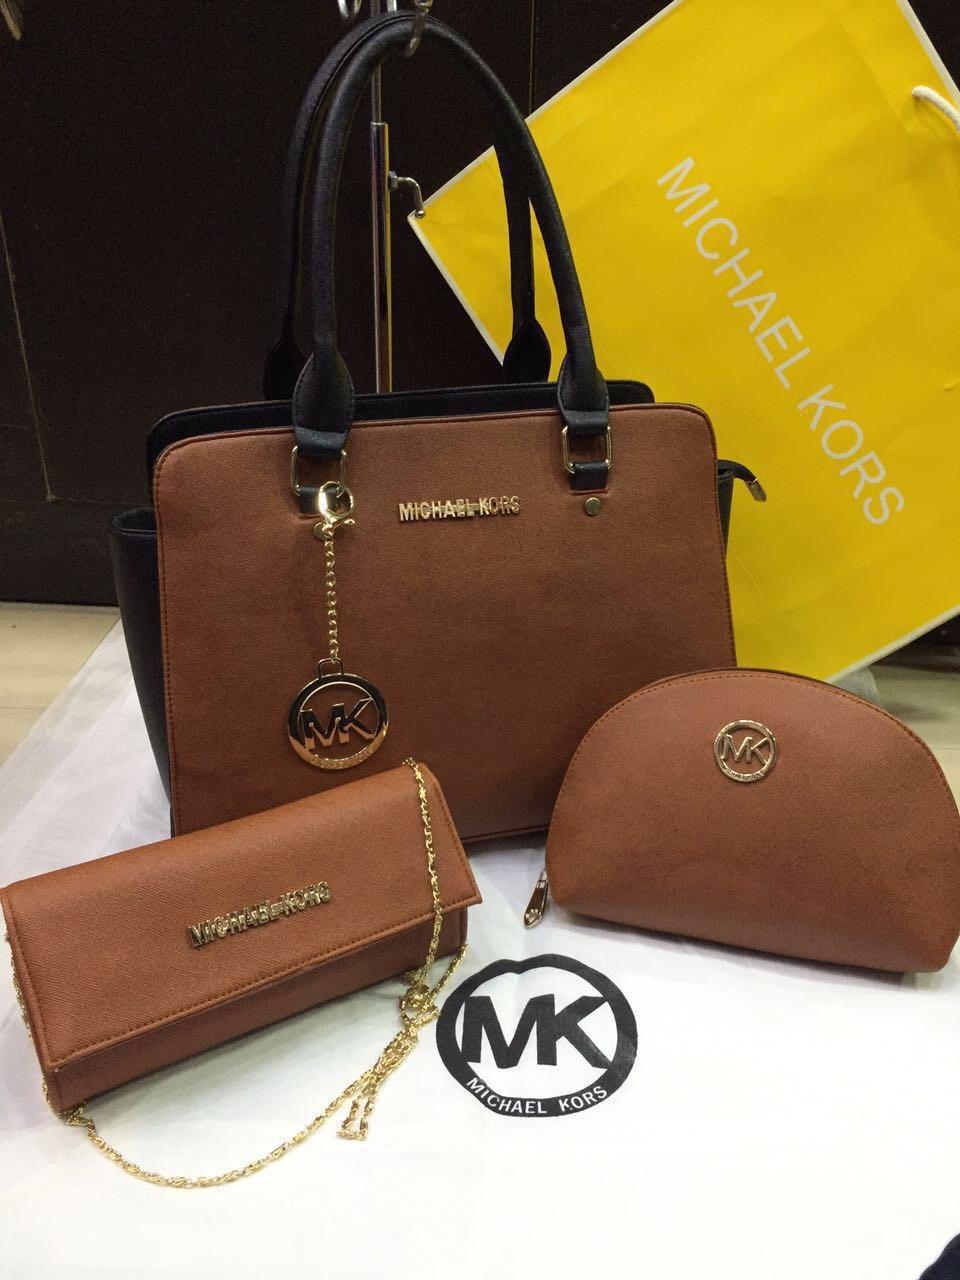 ✨MK Double colour combo ✨✨  ⚡Price :1650+shipping ⚡  💠Limited stock 💠  Whatsapp num 9893705556   #glitzygallery #HandBag #KeepItStylish #handbag#handbagslove#handbagsbrand#hangbags#trendybags#casaul#handbags#spacious#bags#stylish#goodleather#partywear#casualwear#lightweight#lookgo#handbagsessentials #dior #mk #mkbags #mkbag #classylook #brandlove #michaelkors #michaelkorsbag